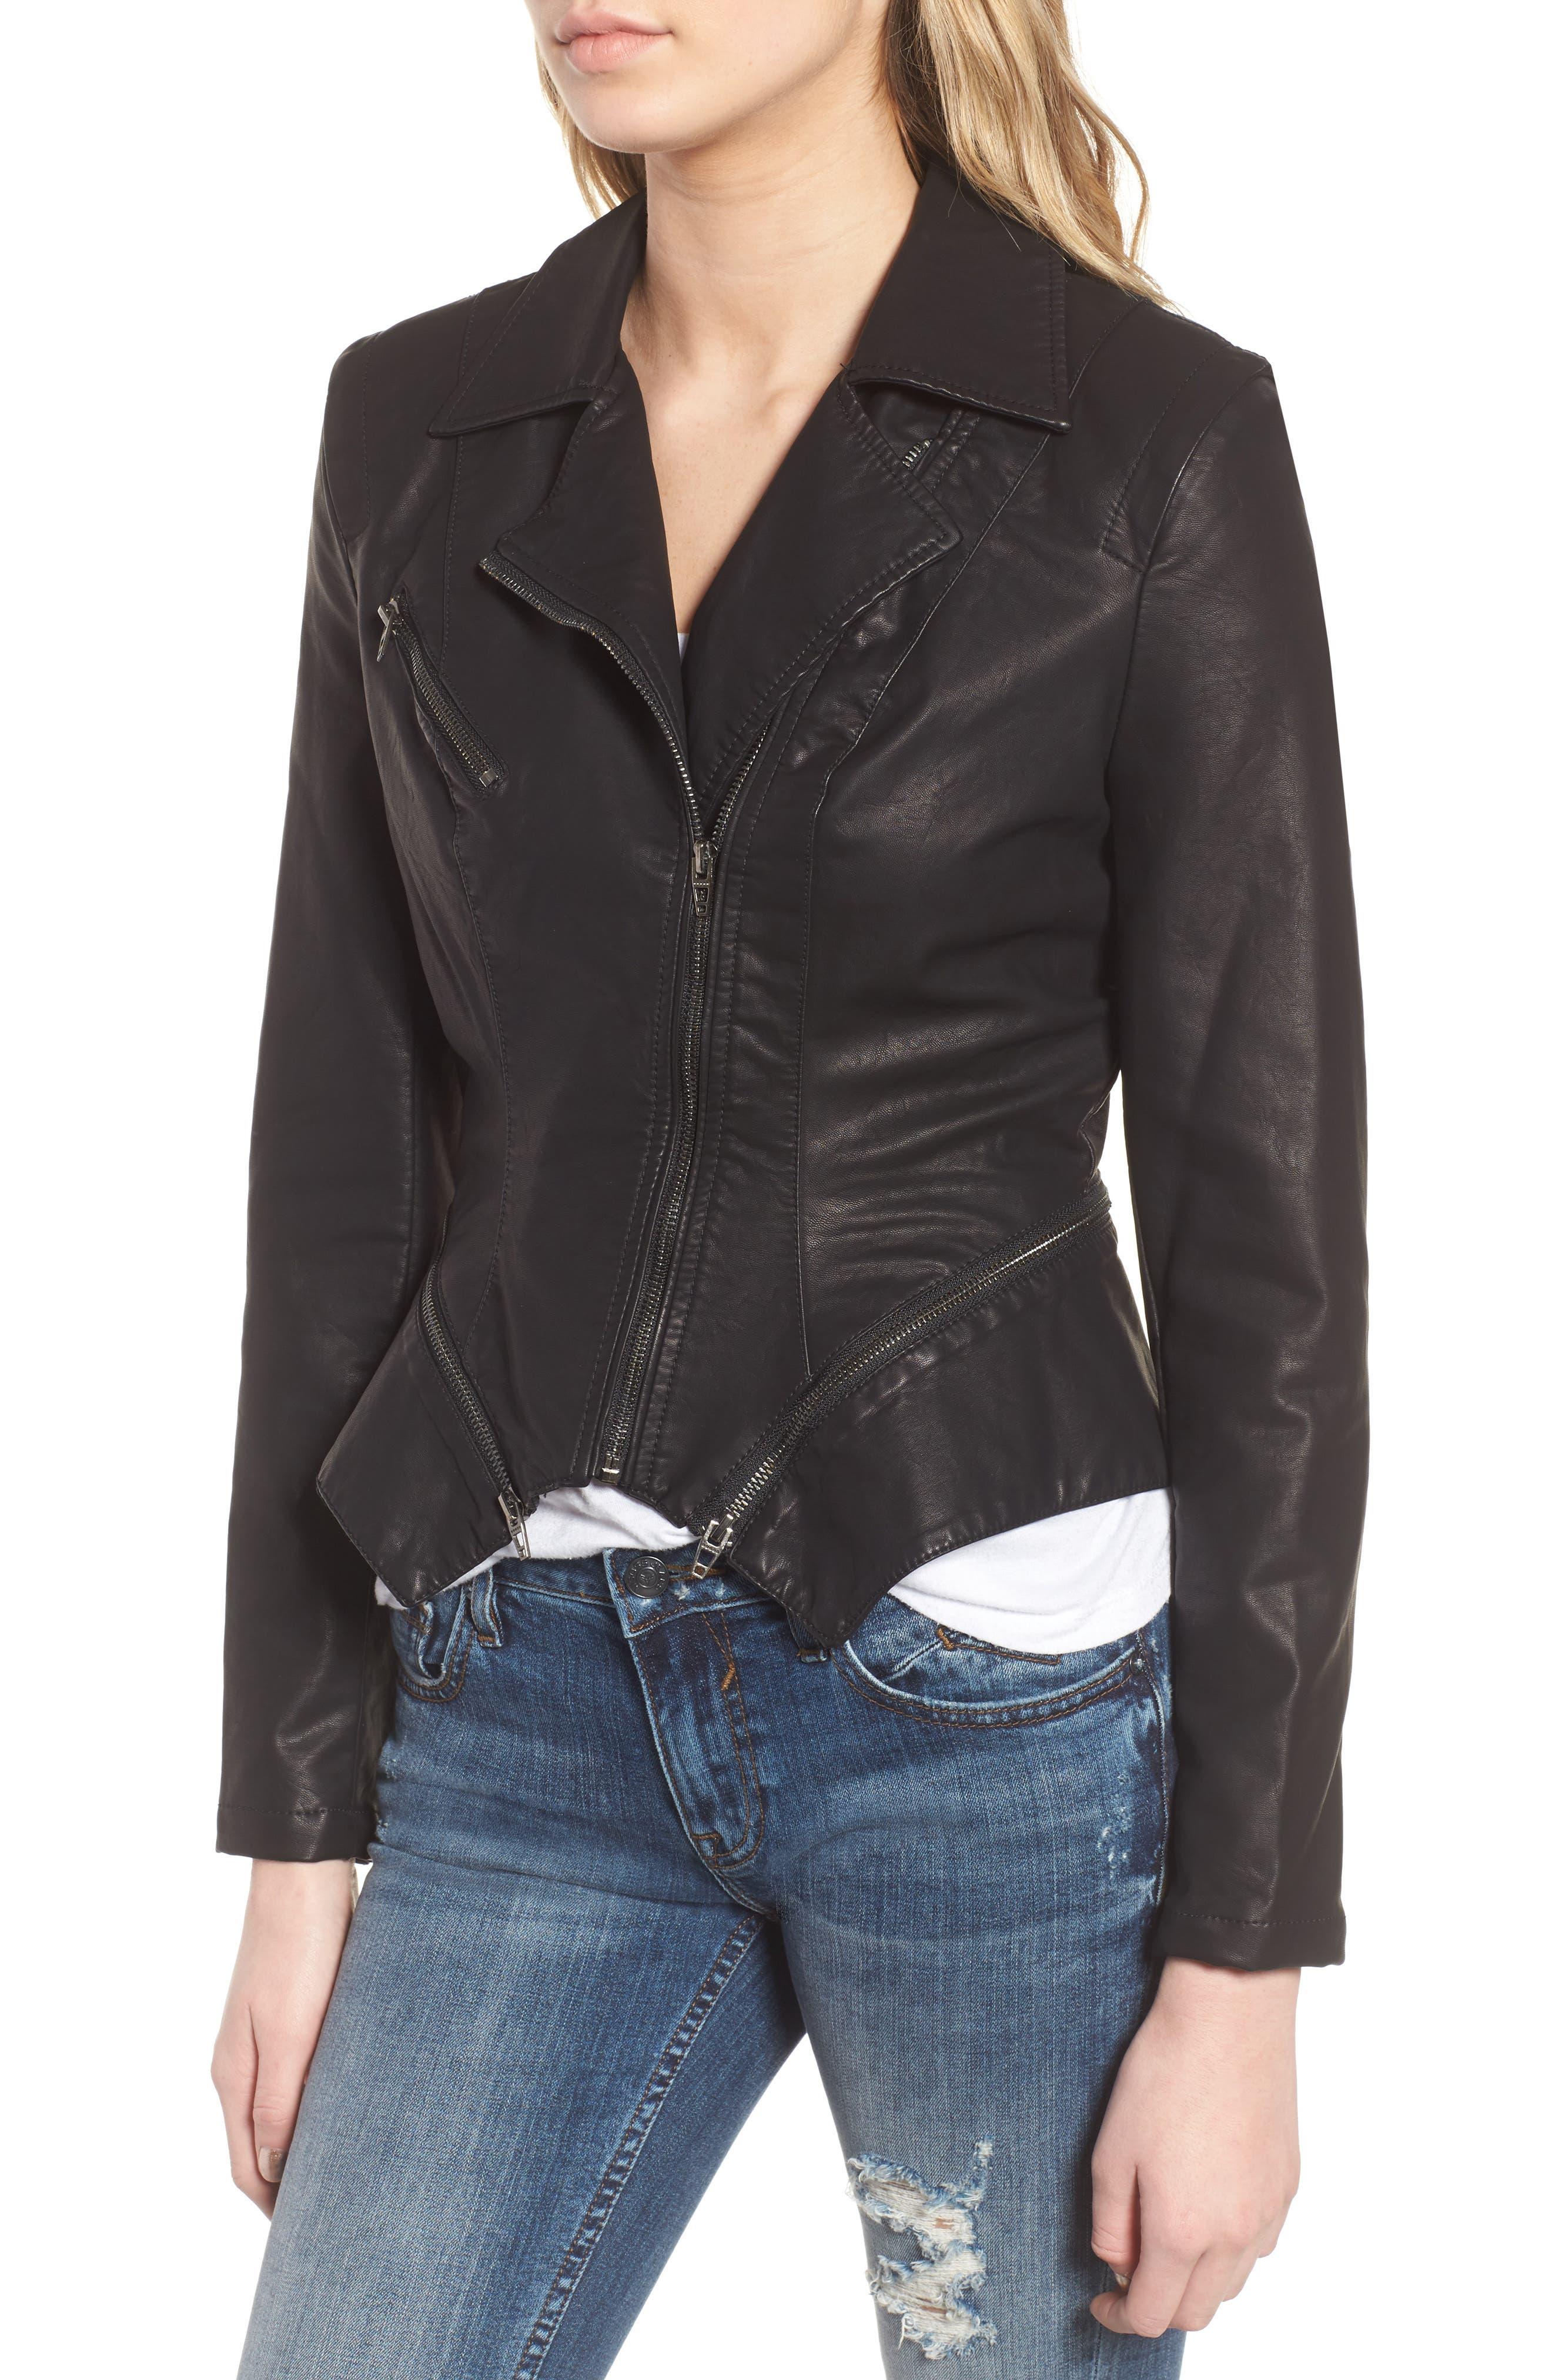 BLANKNYC, Faux Leather Moto Jacket, Alternate thumbnail 6, color, BLACK